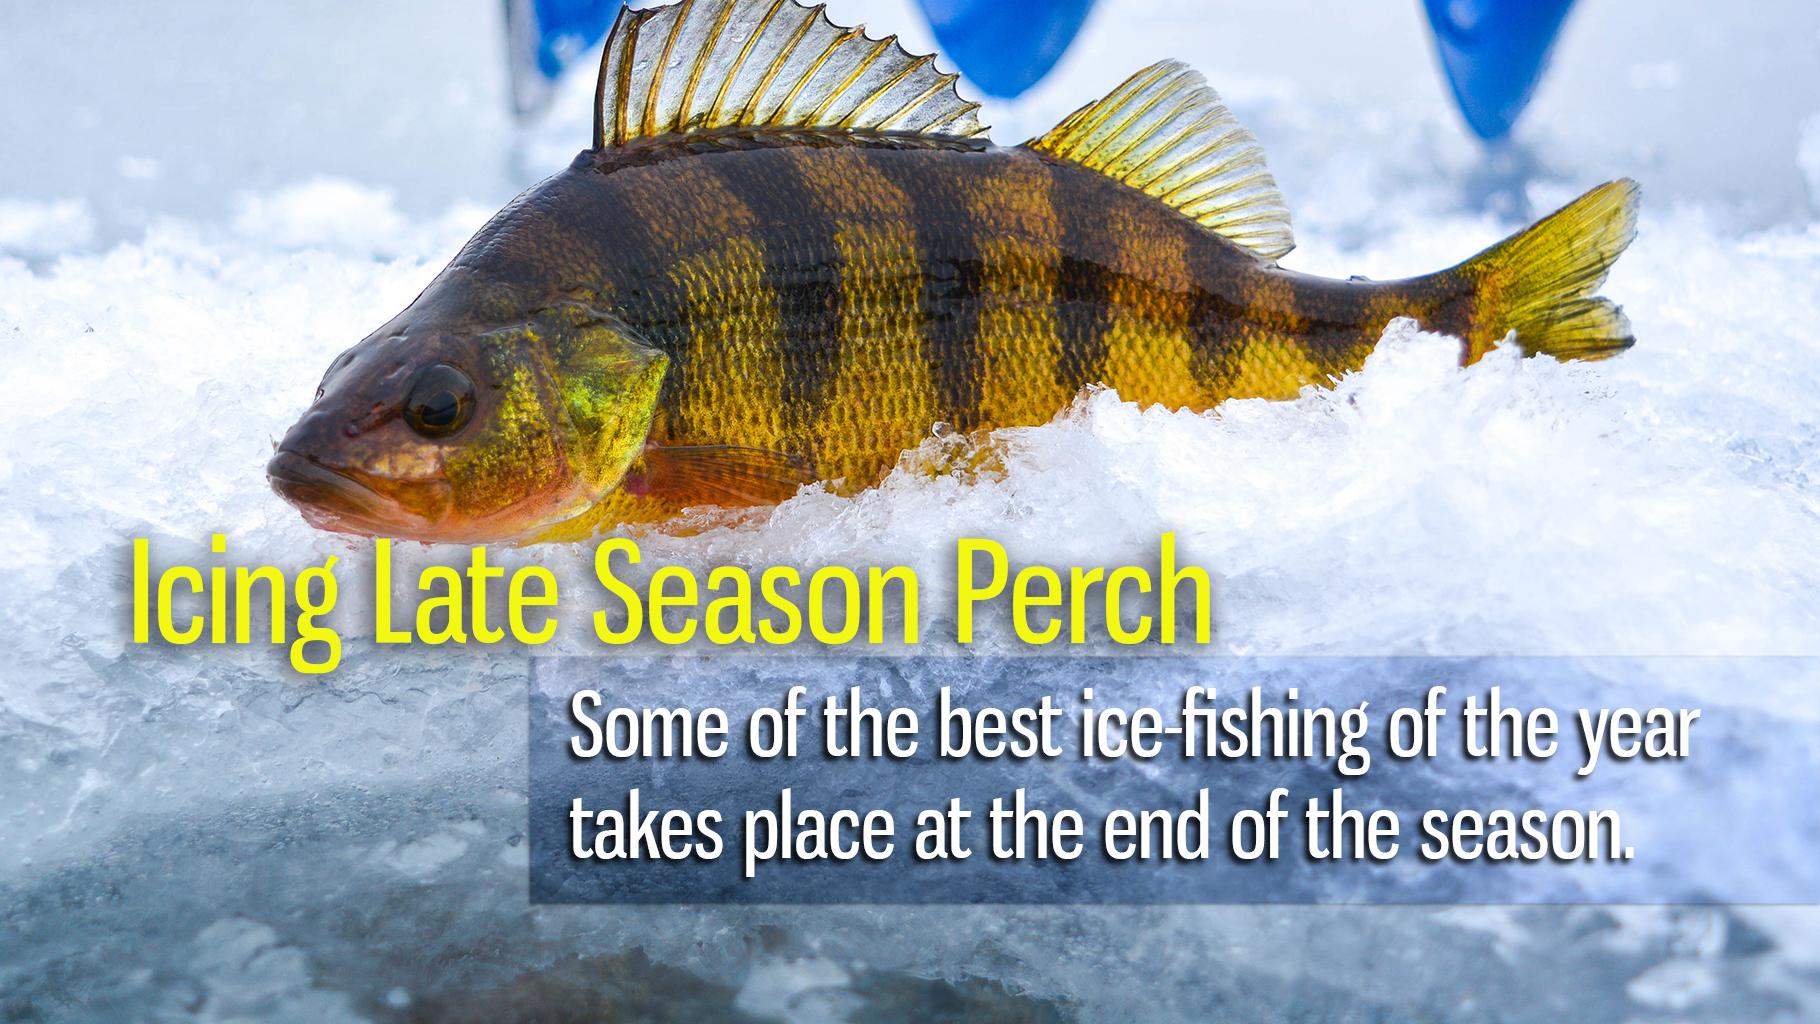 Icing Late Season Perch